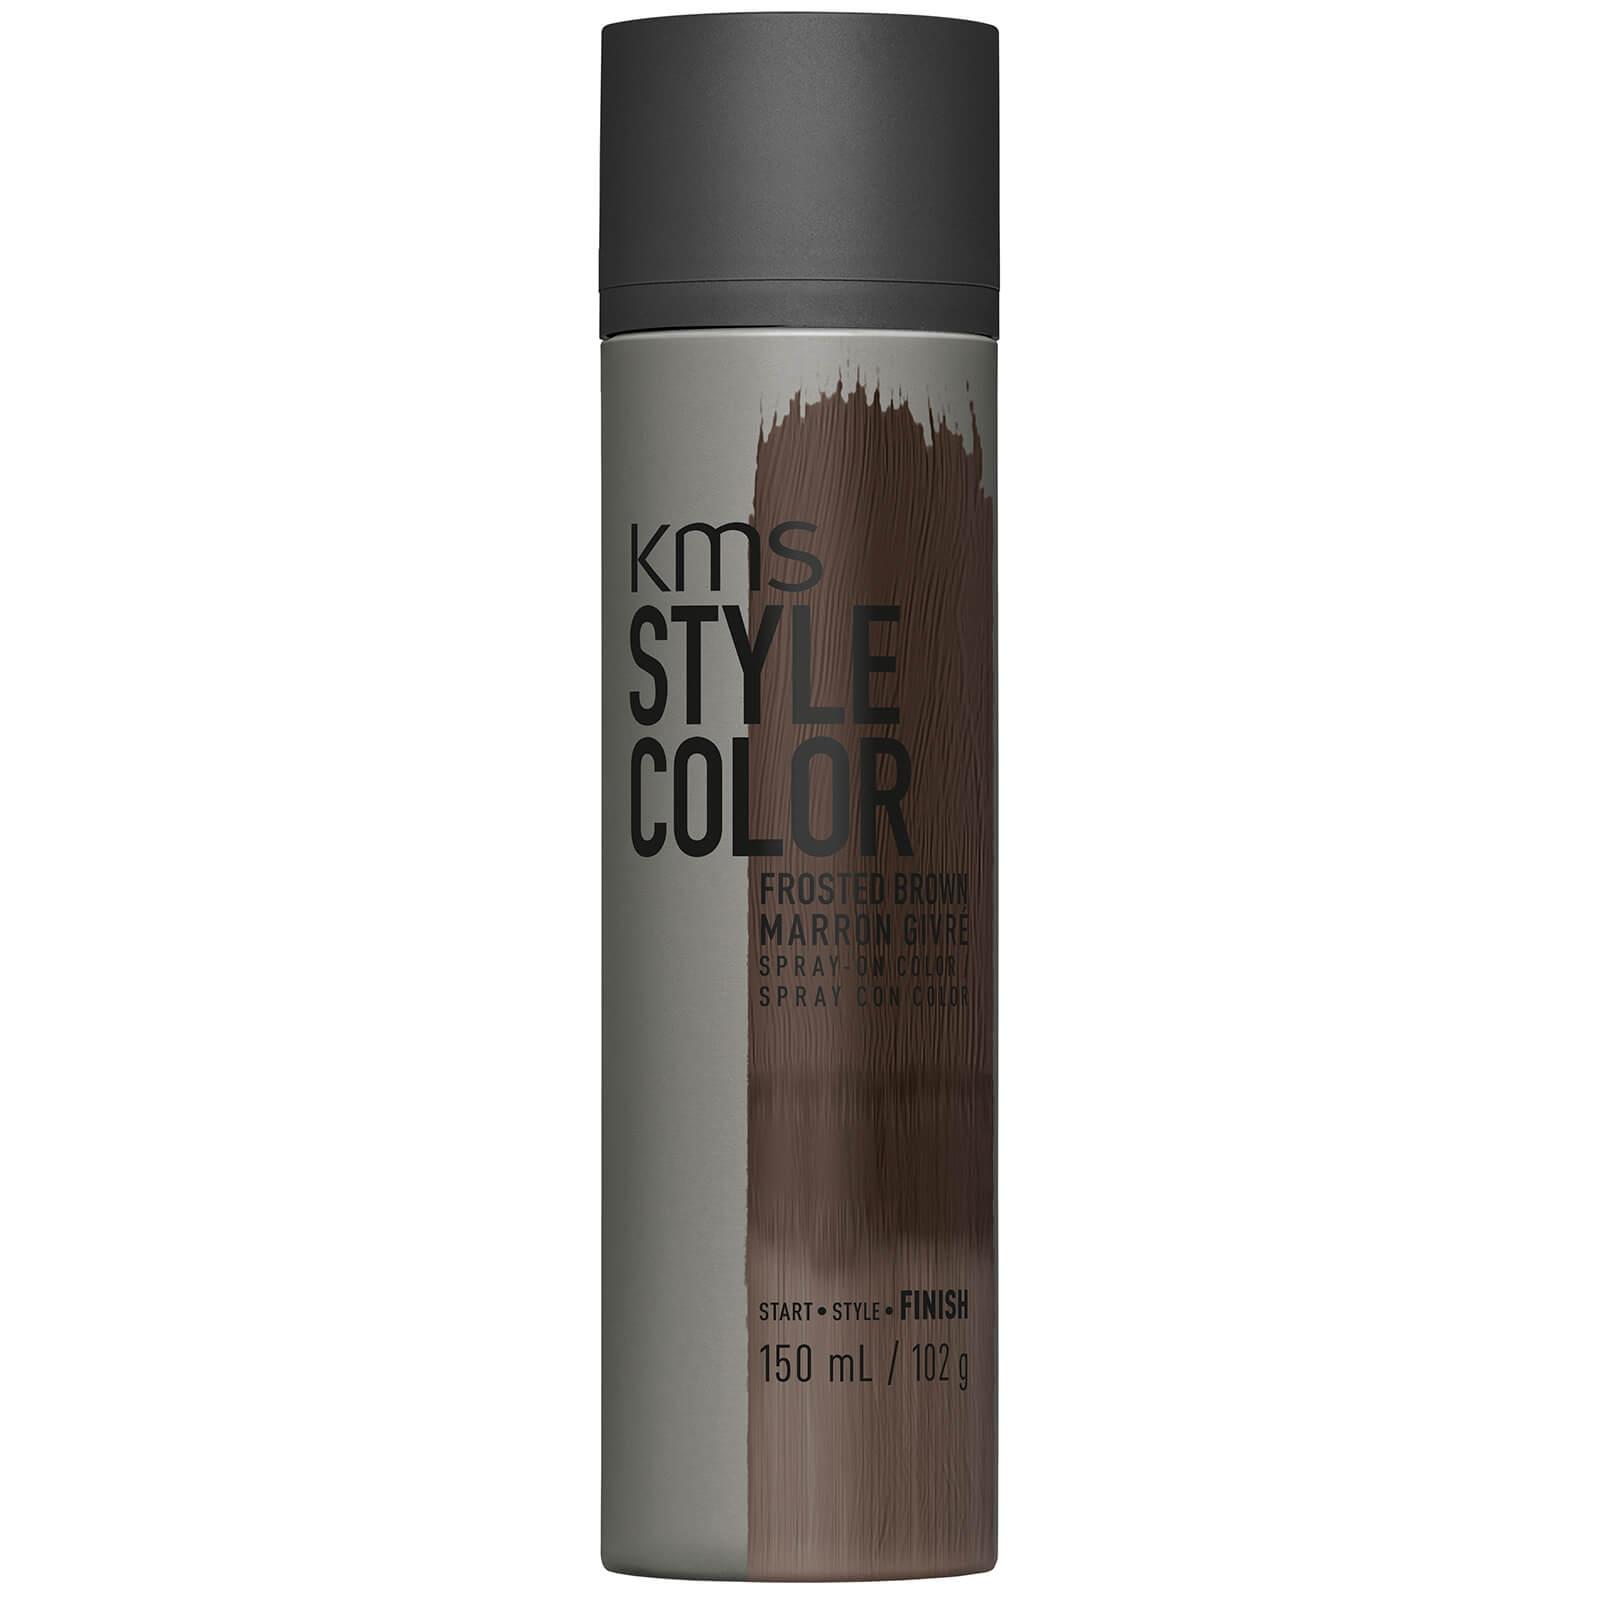 KMS Spray Coloration Style Color KMS 150ml – Marron Givré